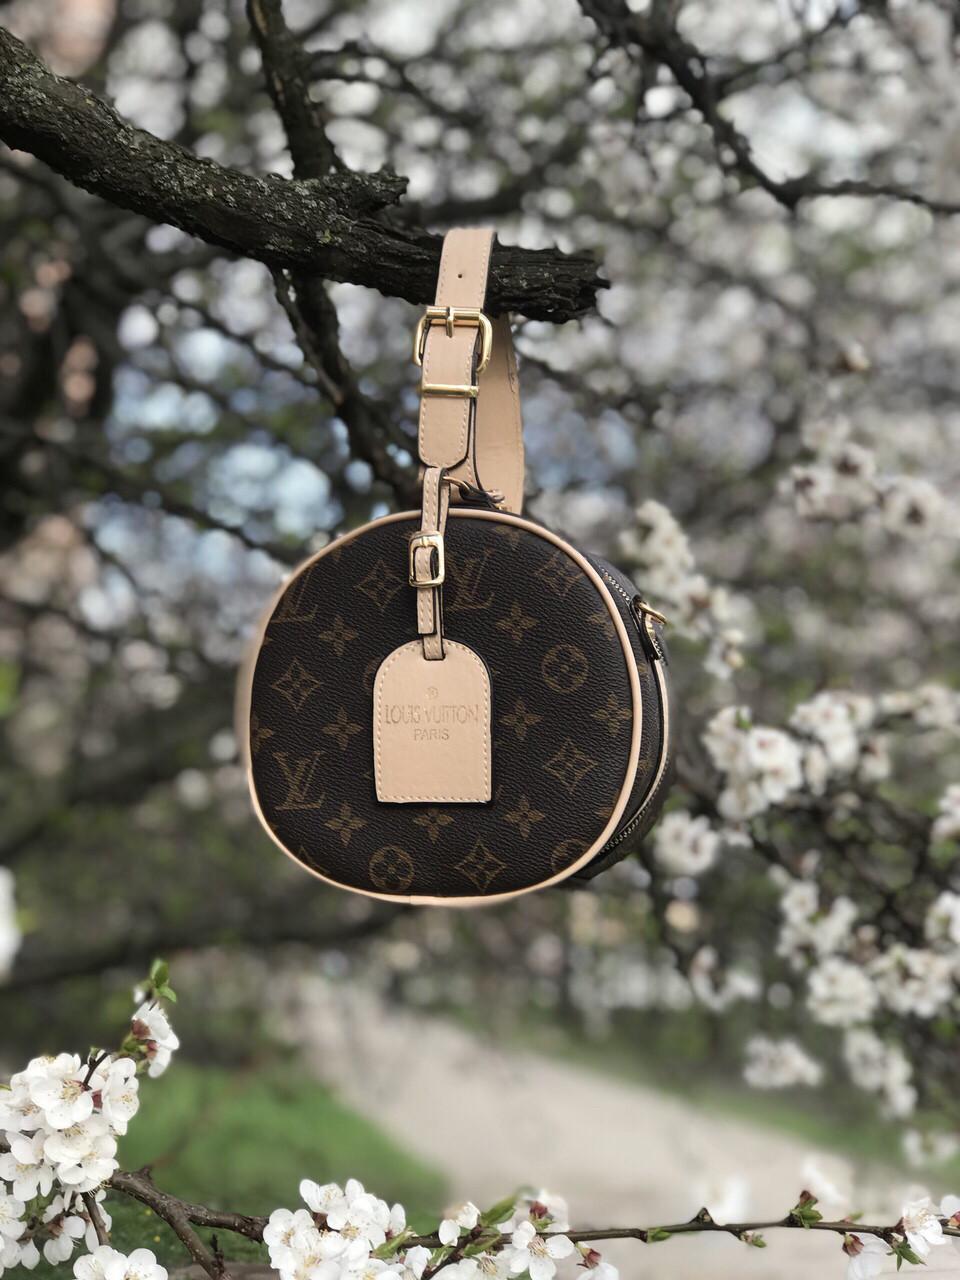 Сумка Клатч  круглая Louis Vuitton (реплика луи витон)